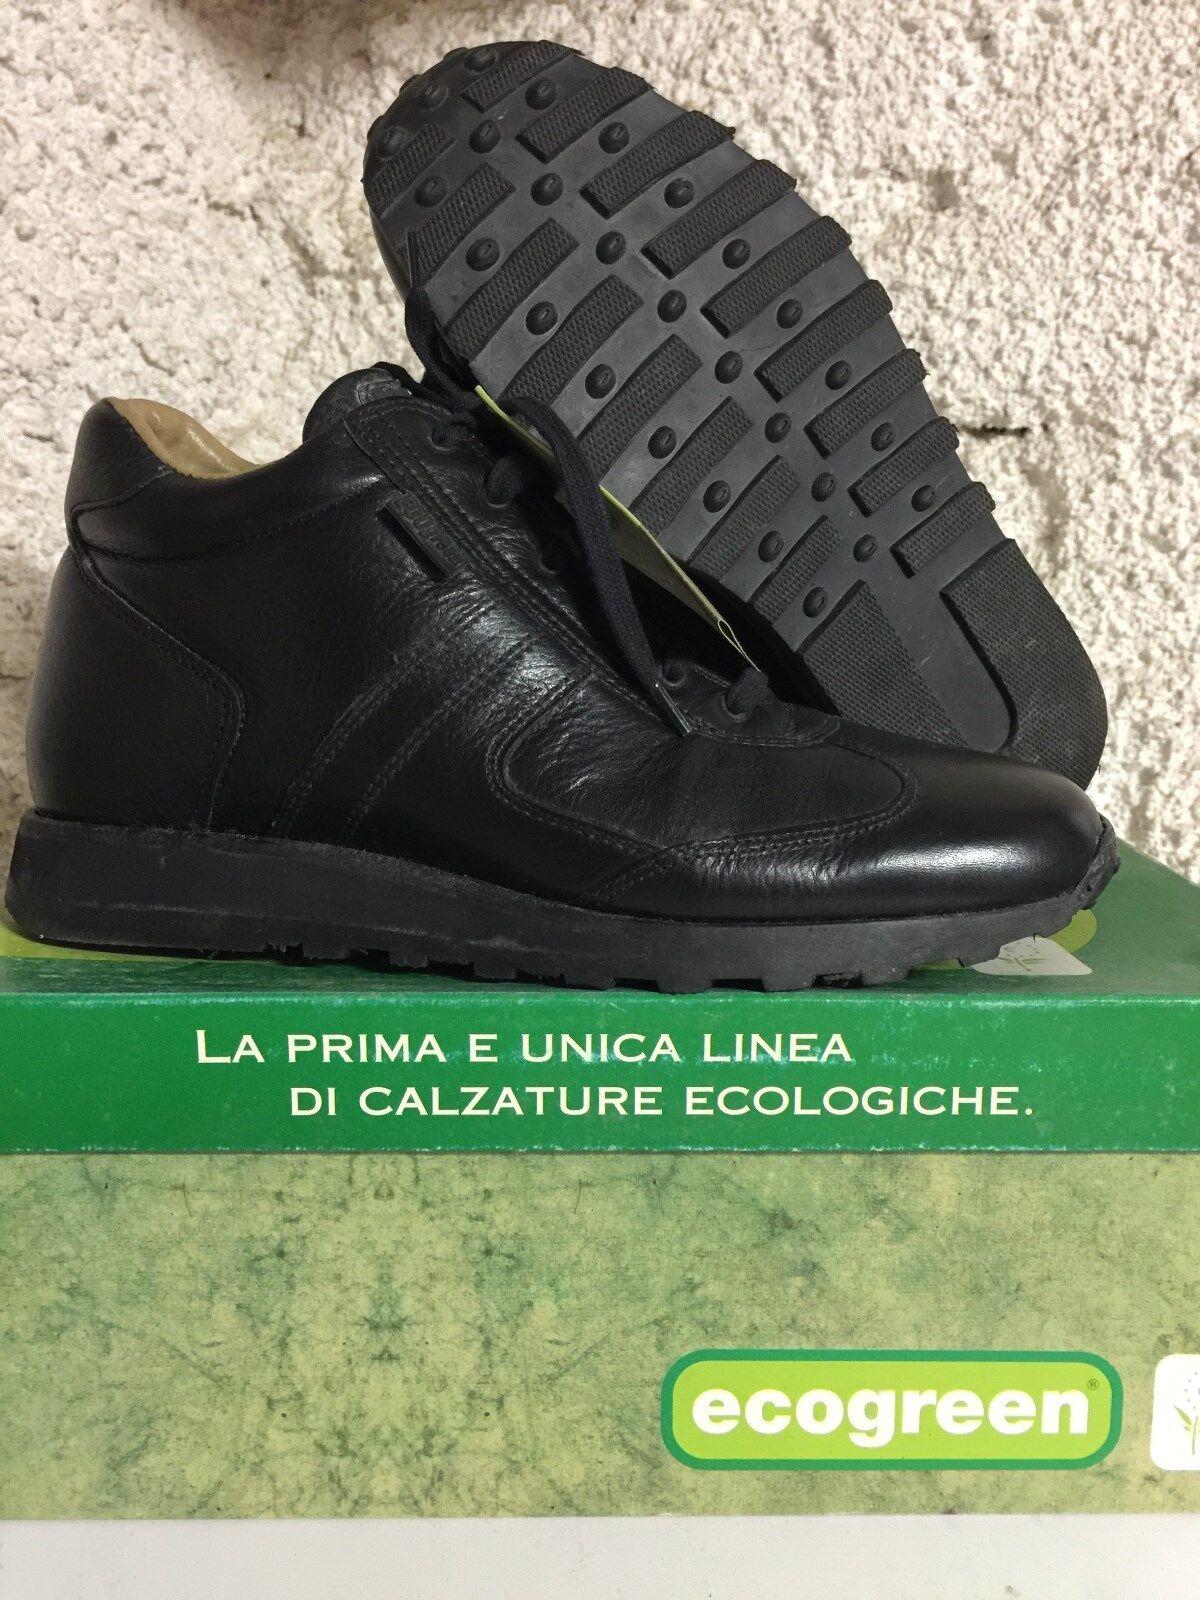 Scarpa uomo ECOGREEN n°40  (Tg.6 Eu) Made in italy